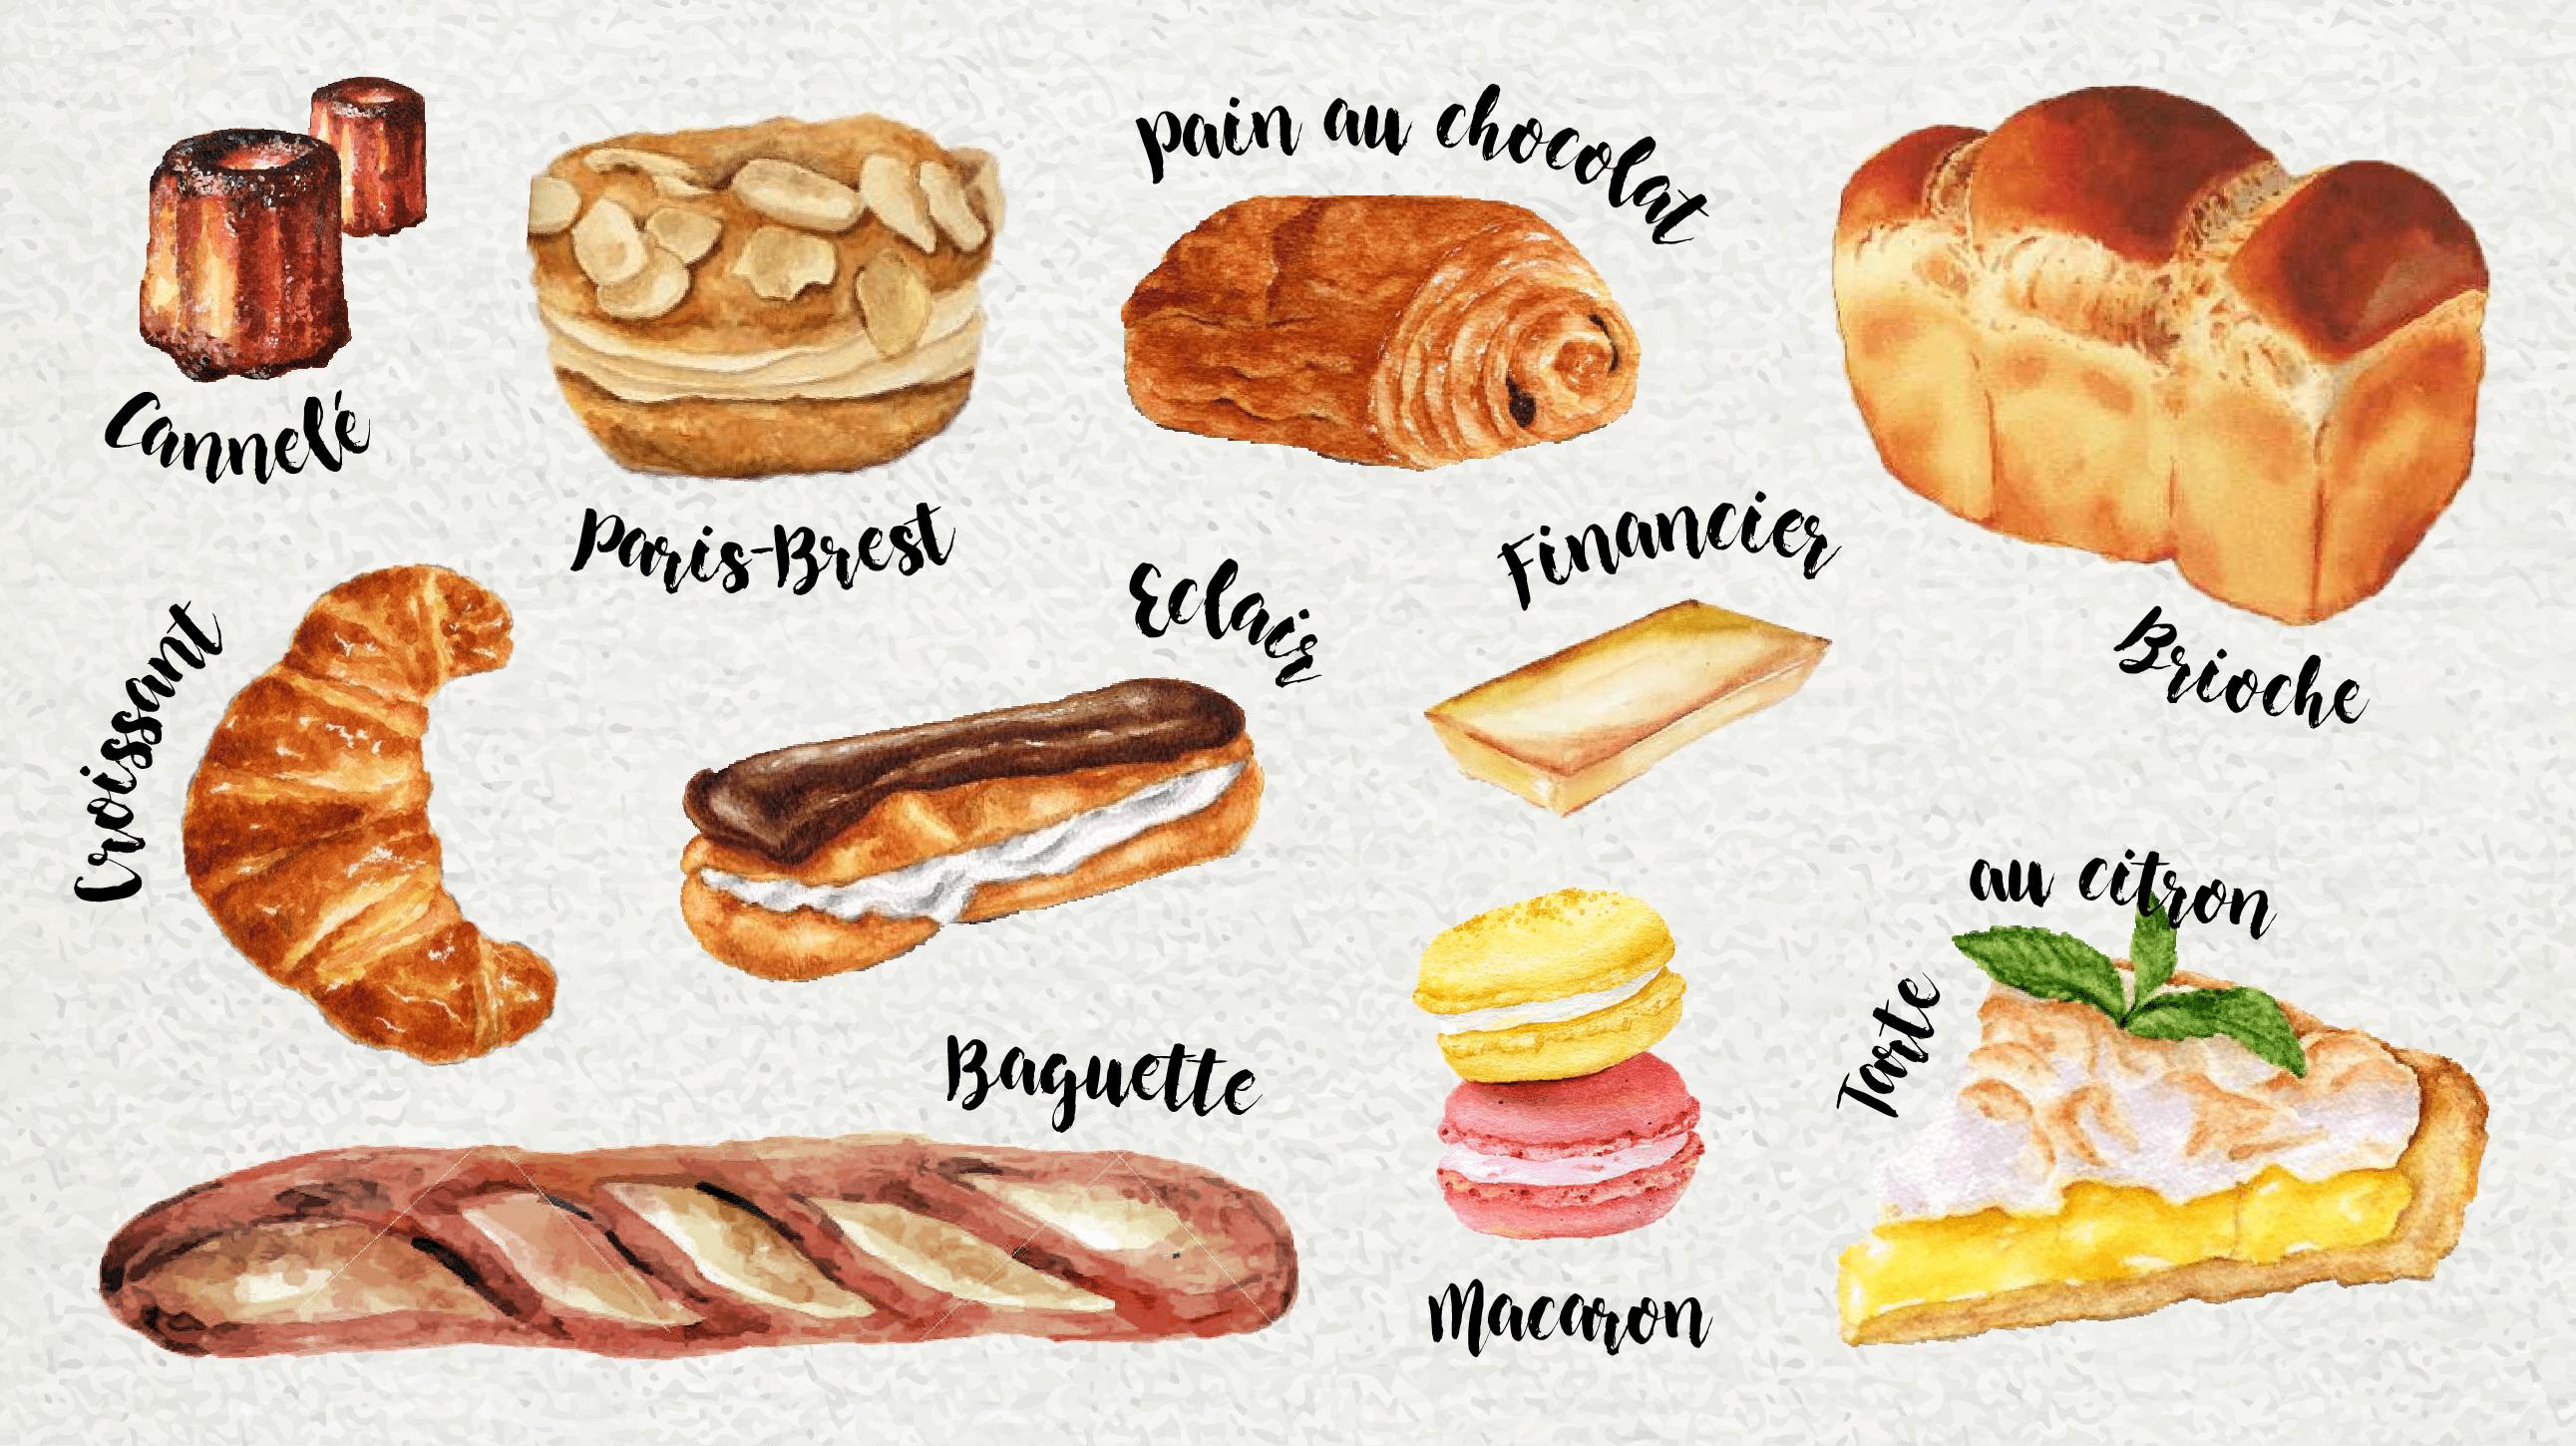 El abc de la panader a y pasteler a francesa for Comida mas famosa de francia